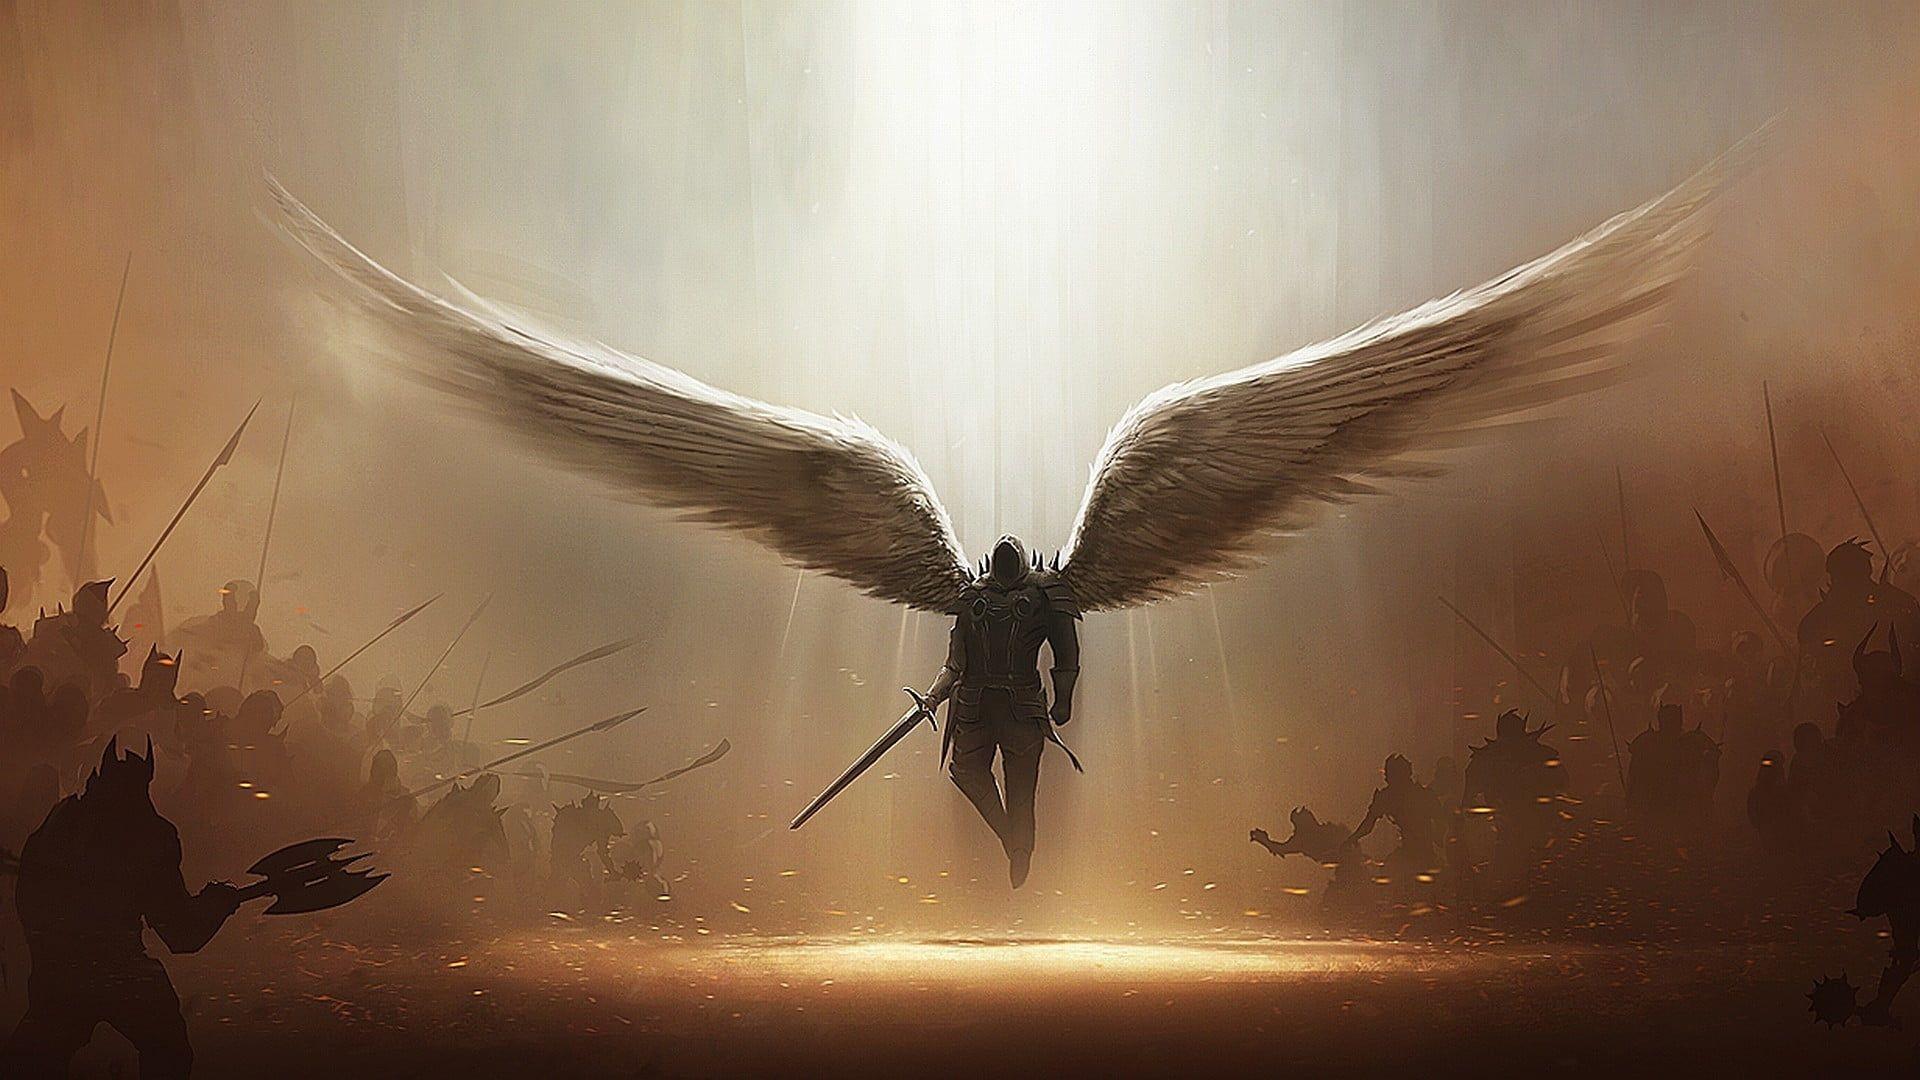 Pin By Leonidas Vero On G Angel Wallpaper Archangels Angel W